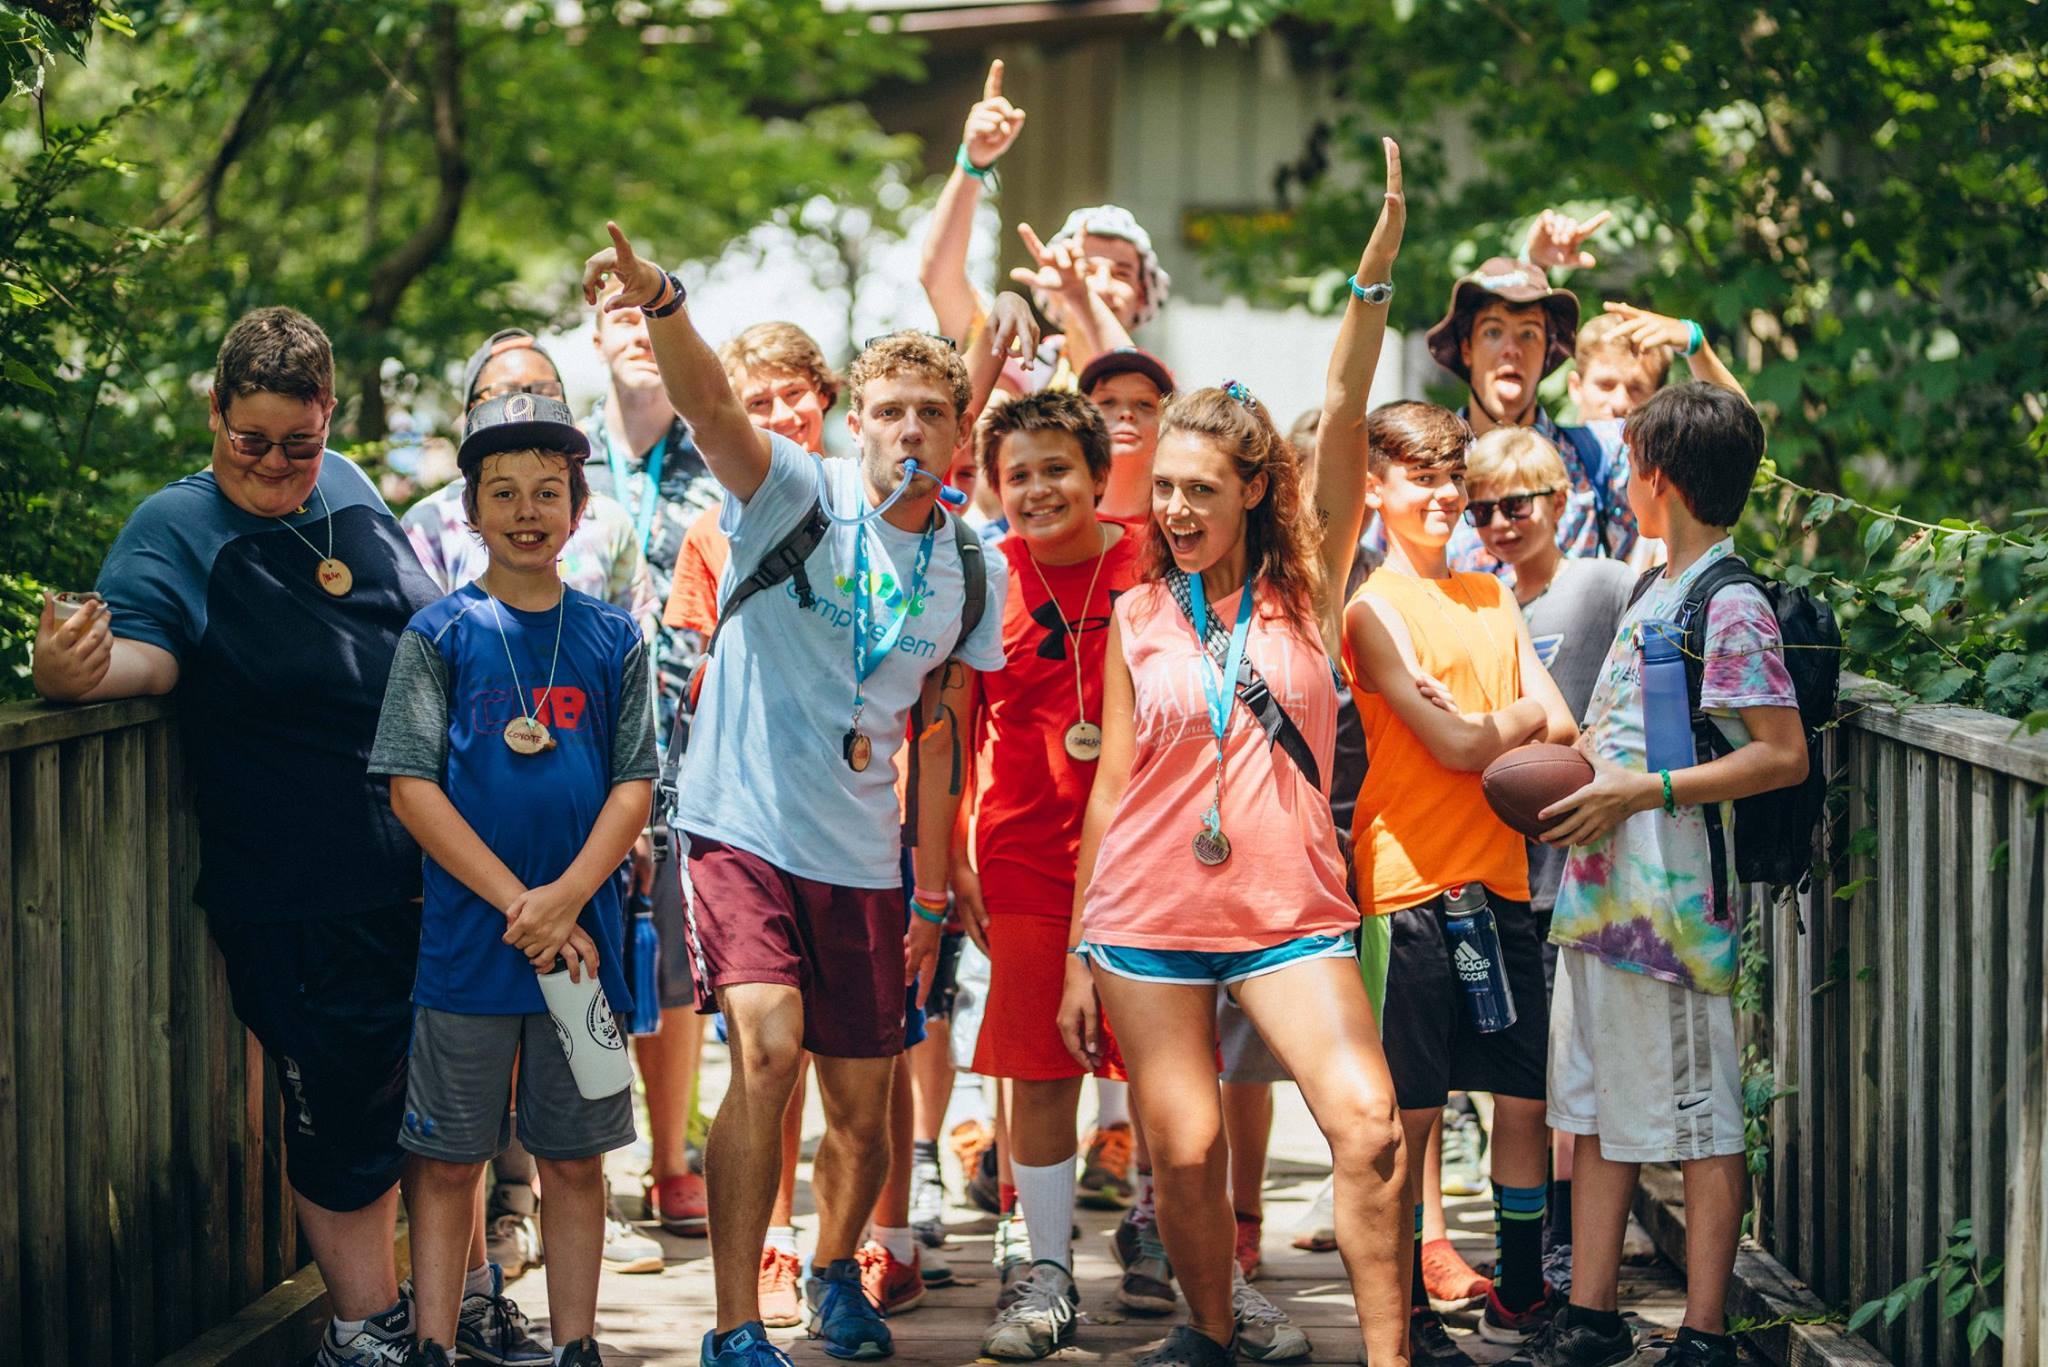 Campers at SLU's Camp Kesem whoop it up during last year's free week-long session.